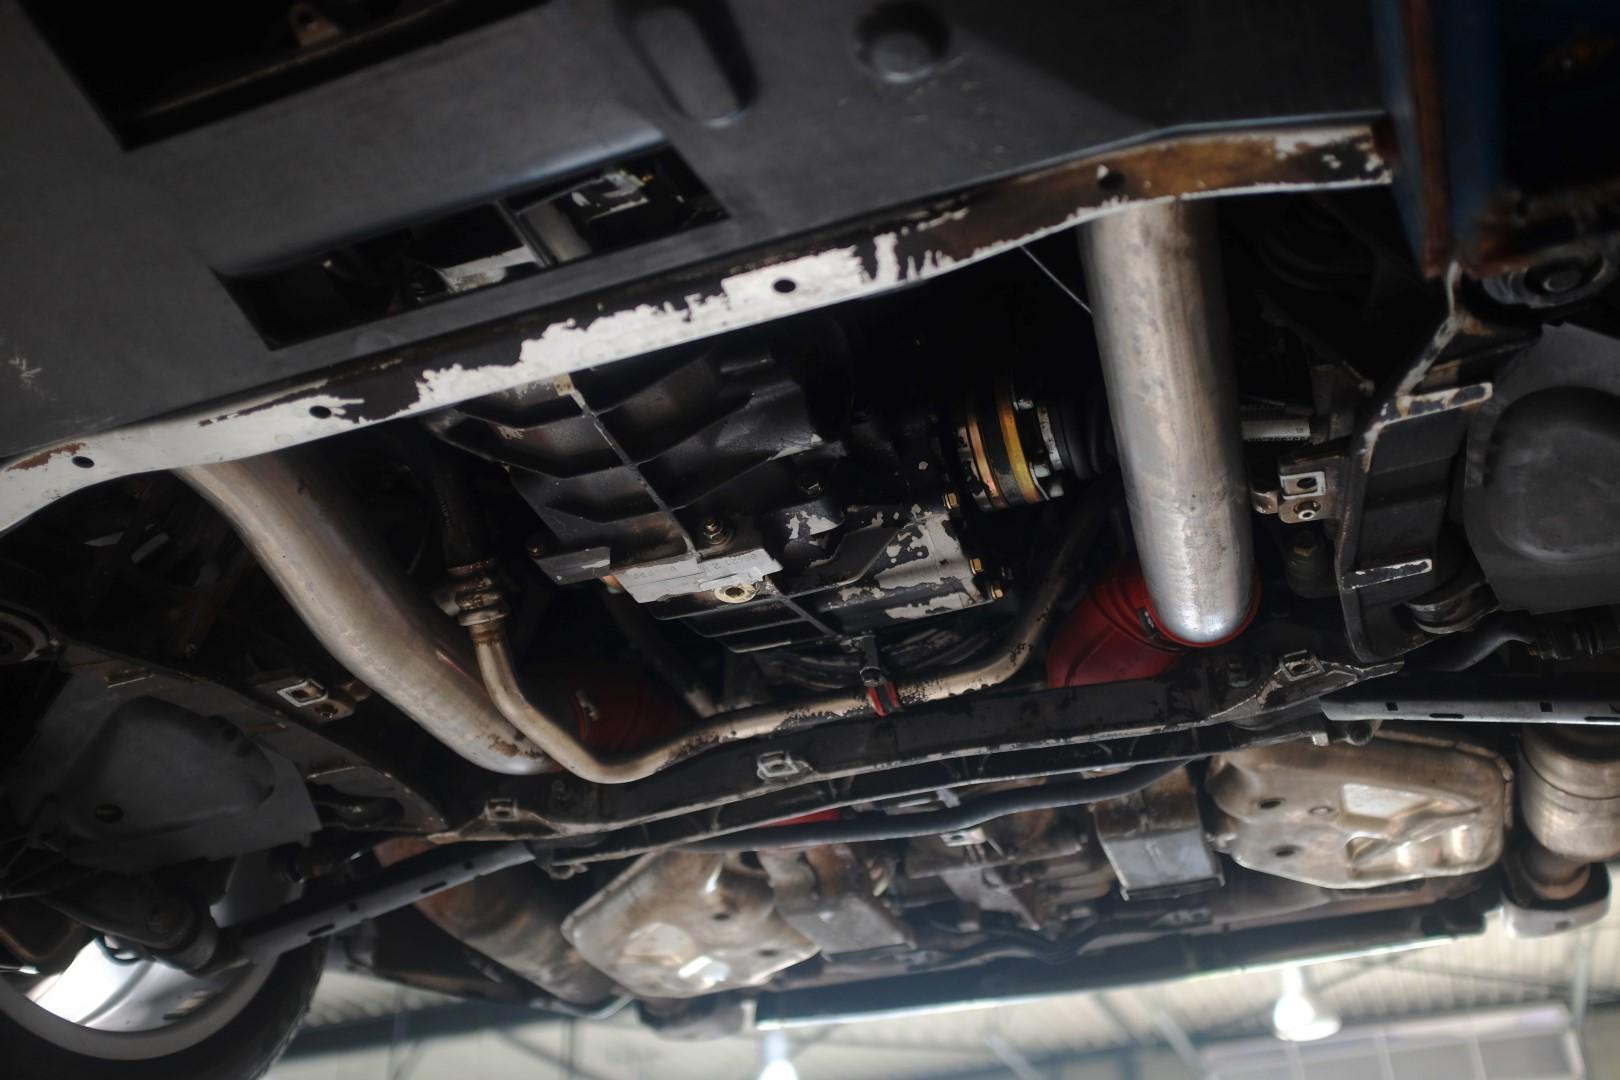 onderkant motor en versnellingsbak